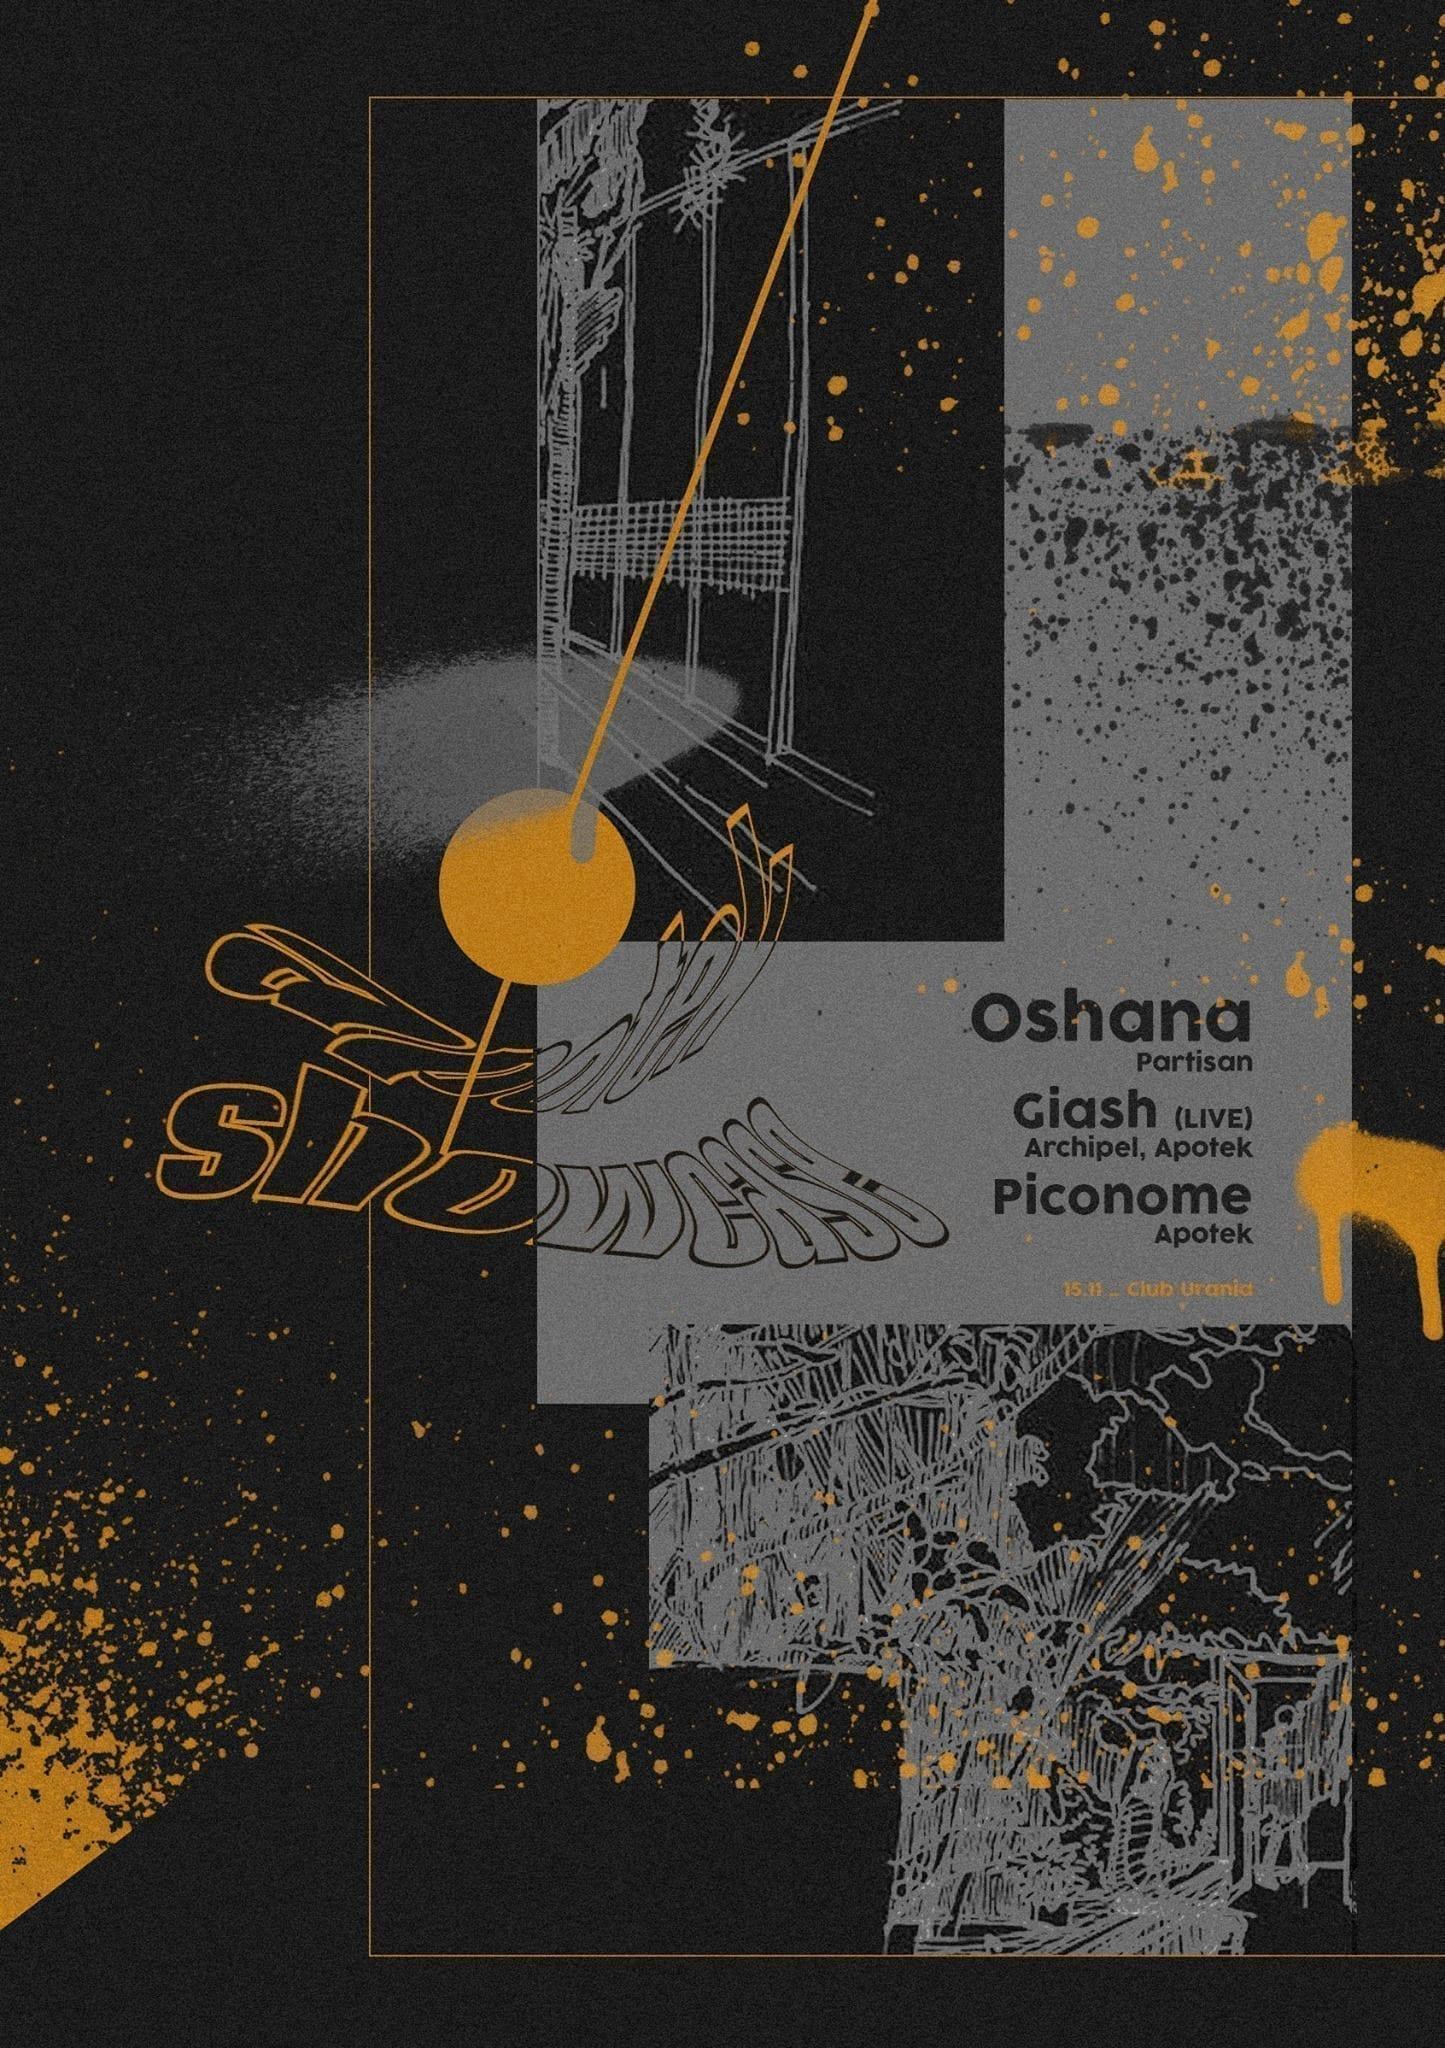 Apotek 0.23 w: Oshana Giash [Live] Piconome